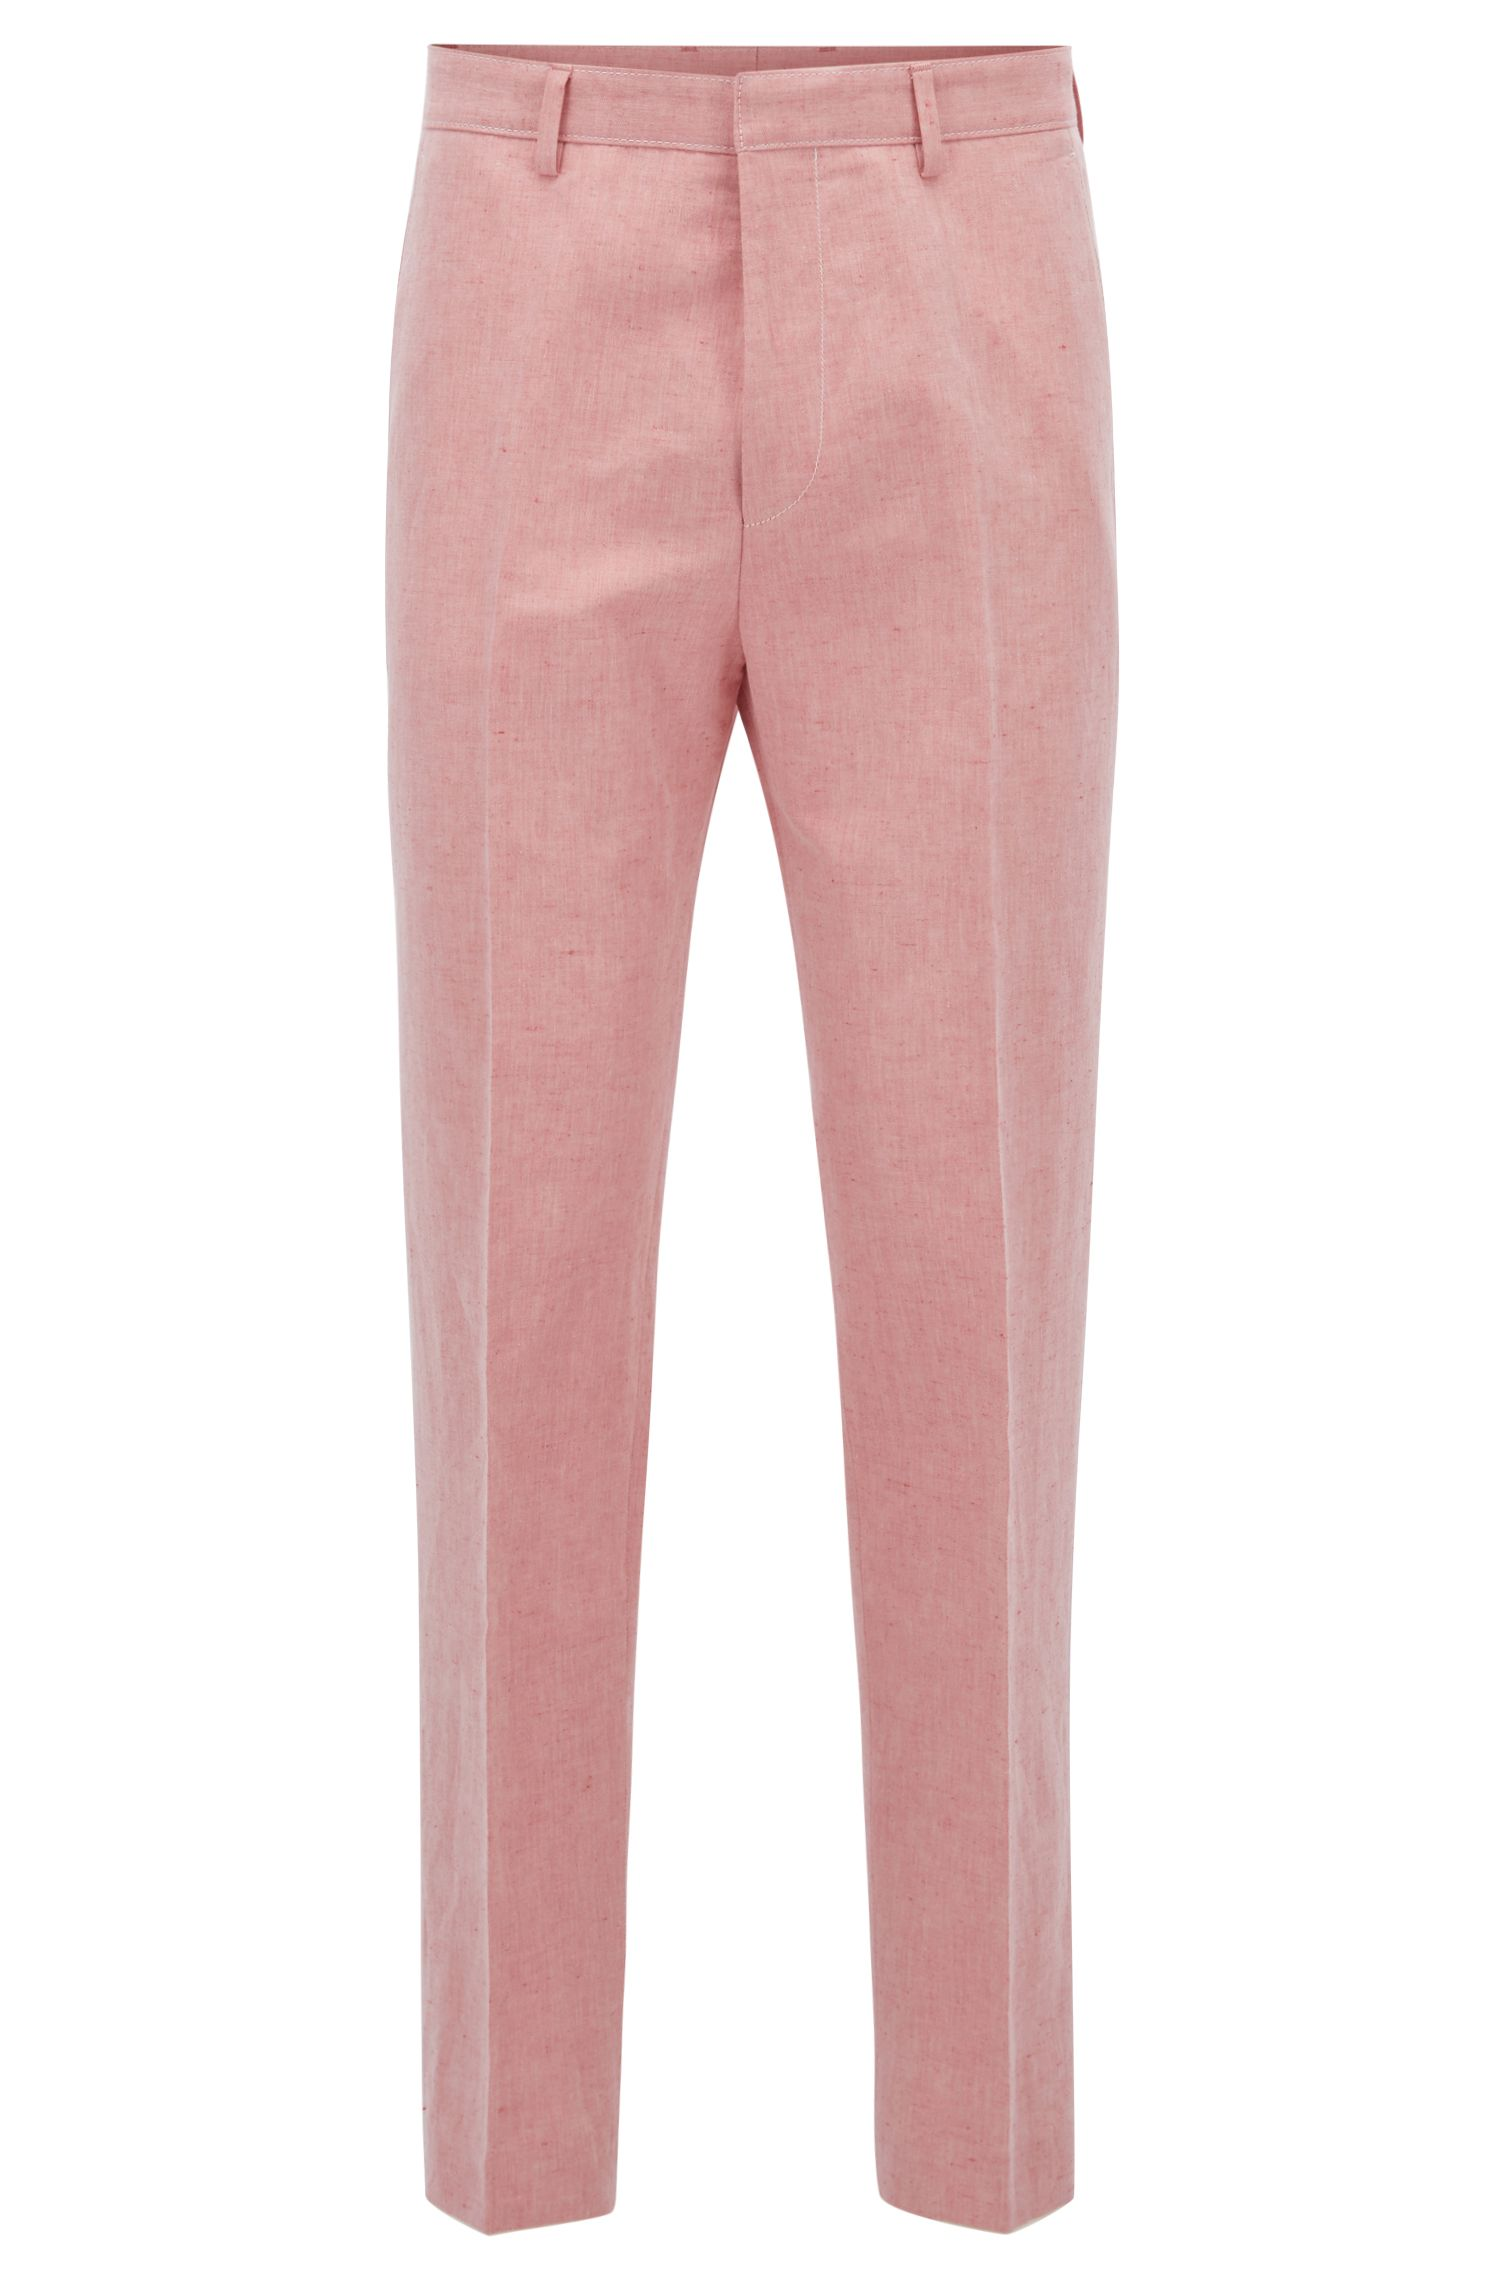 Linen Cotton Dress Pant, Slim Fit | Pirko